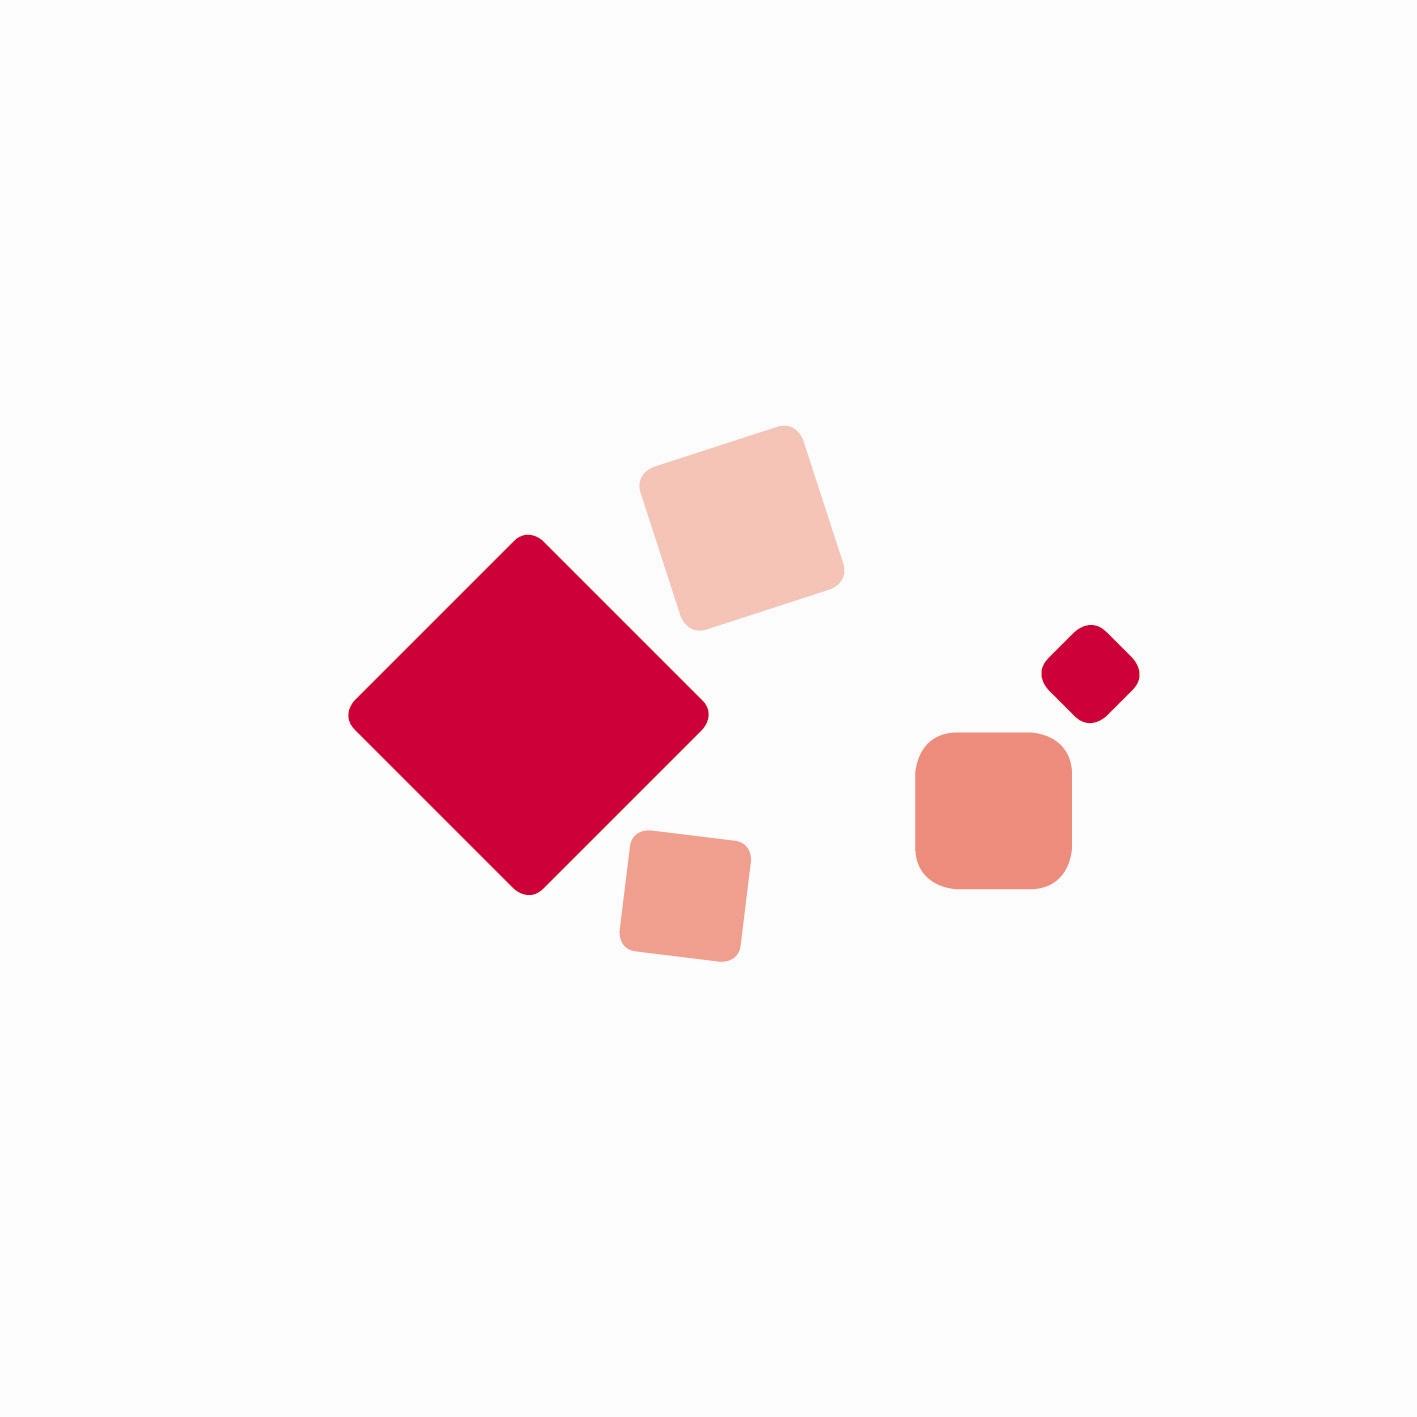 Logo_Wuerfelchen_rot